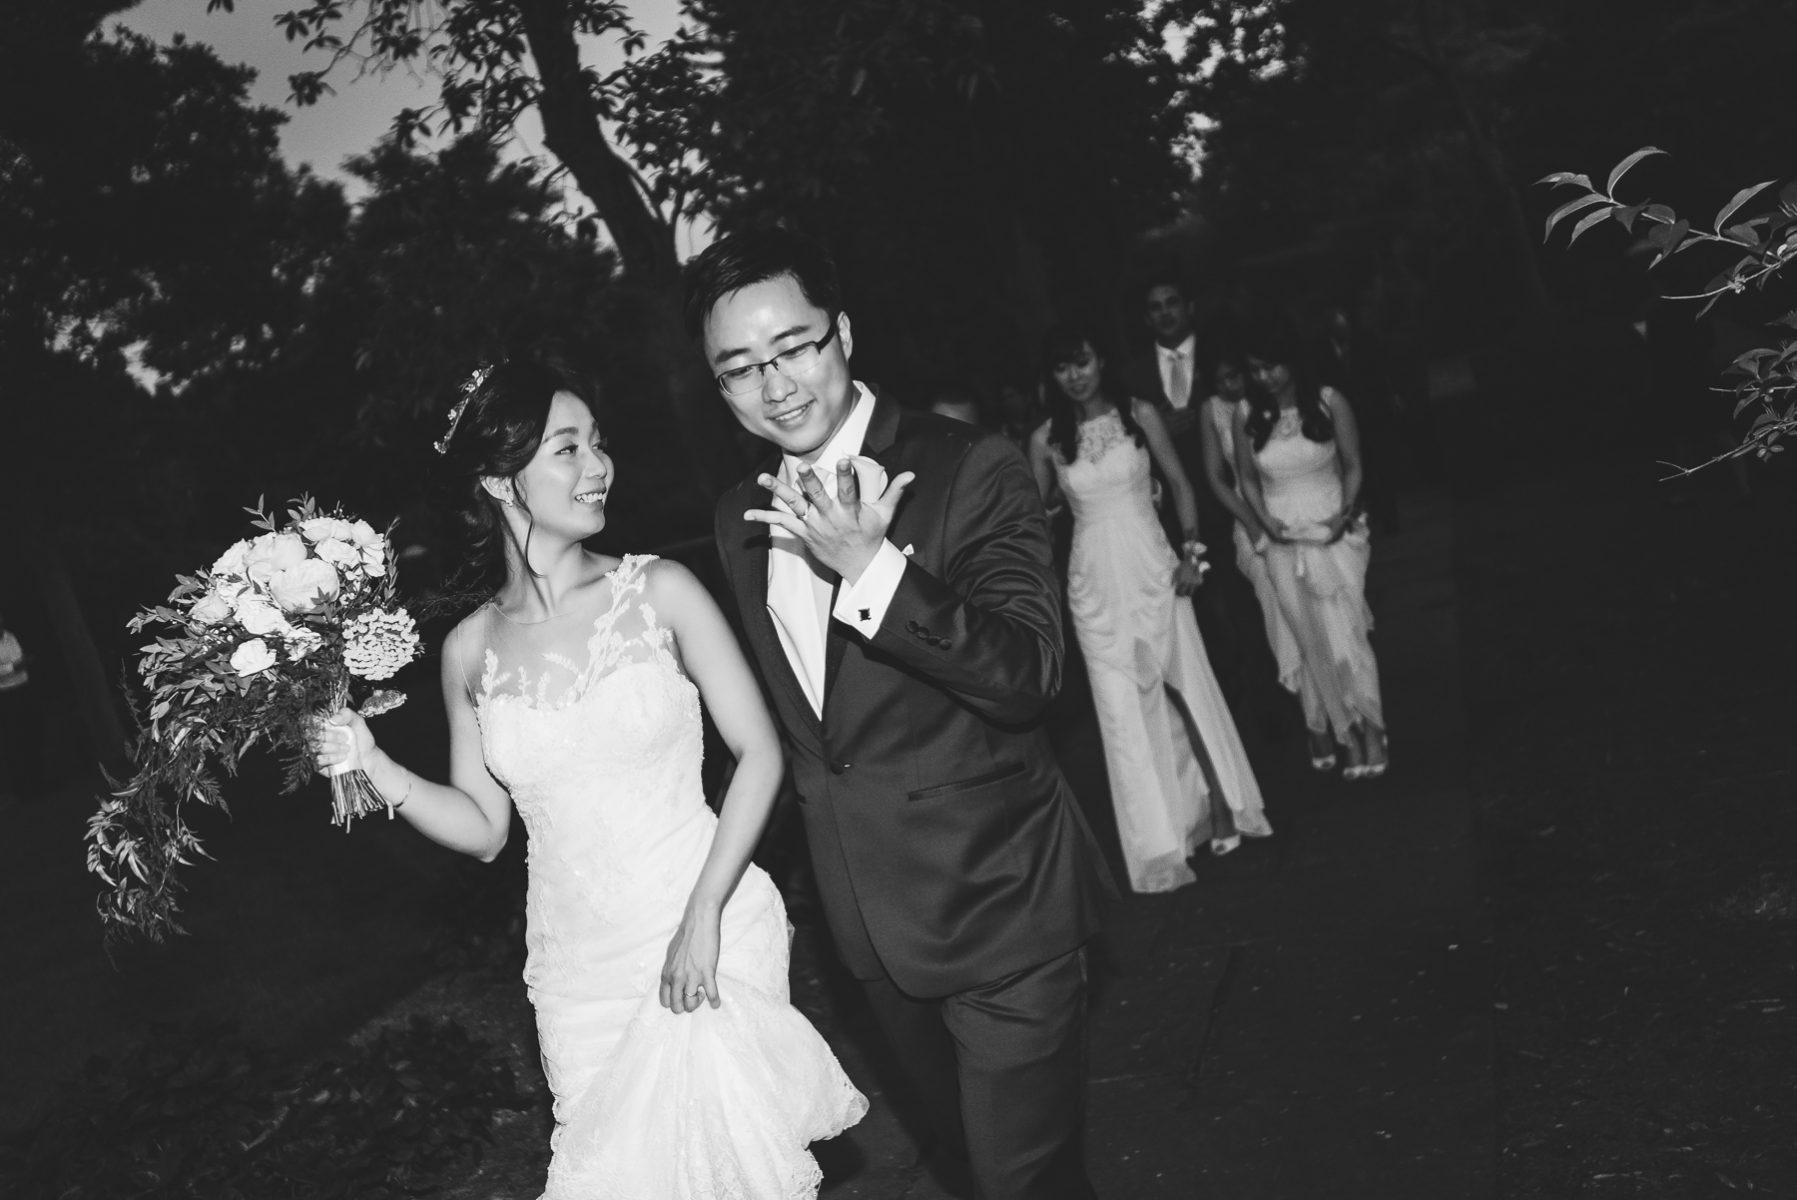 New Jersey Skylands manor wedding - capturing a moment